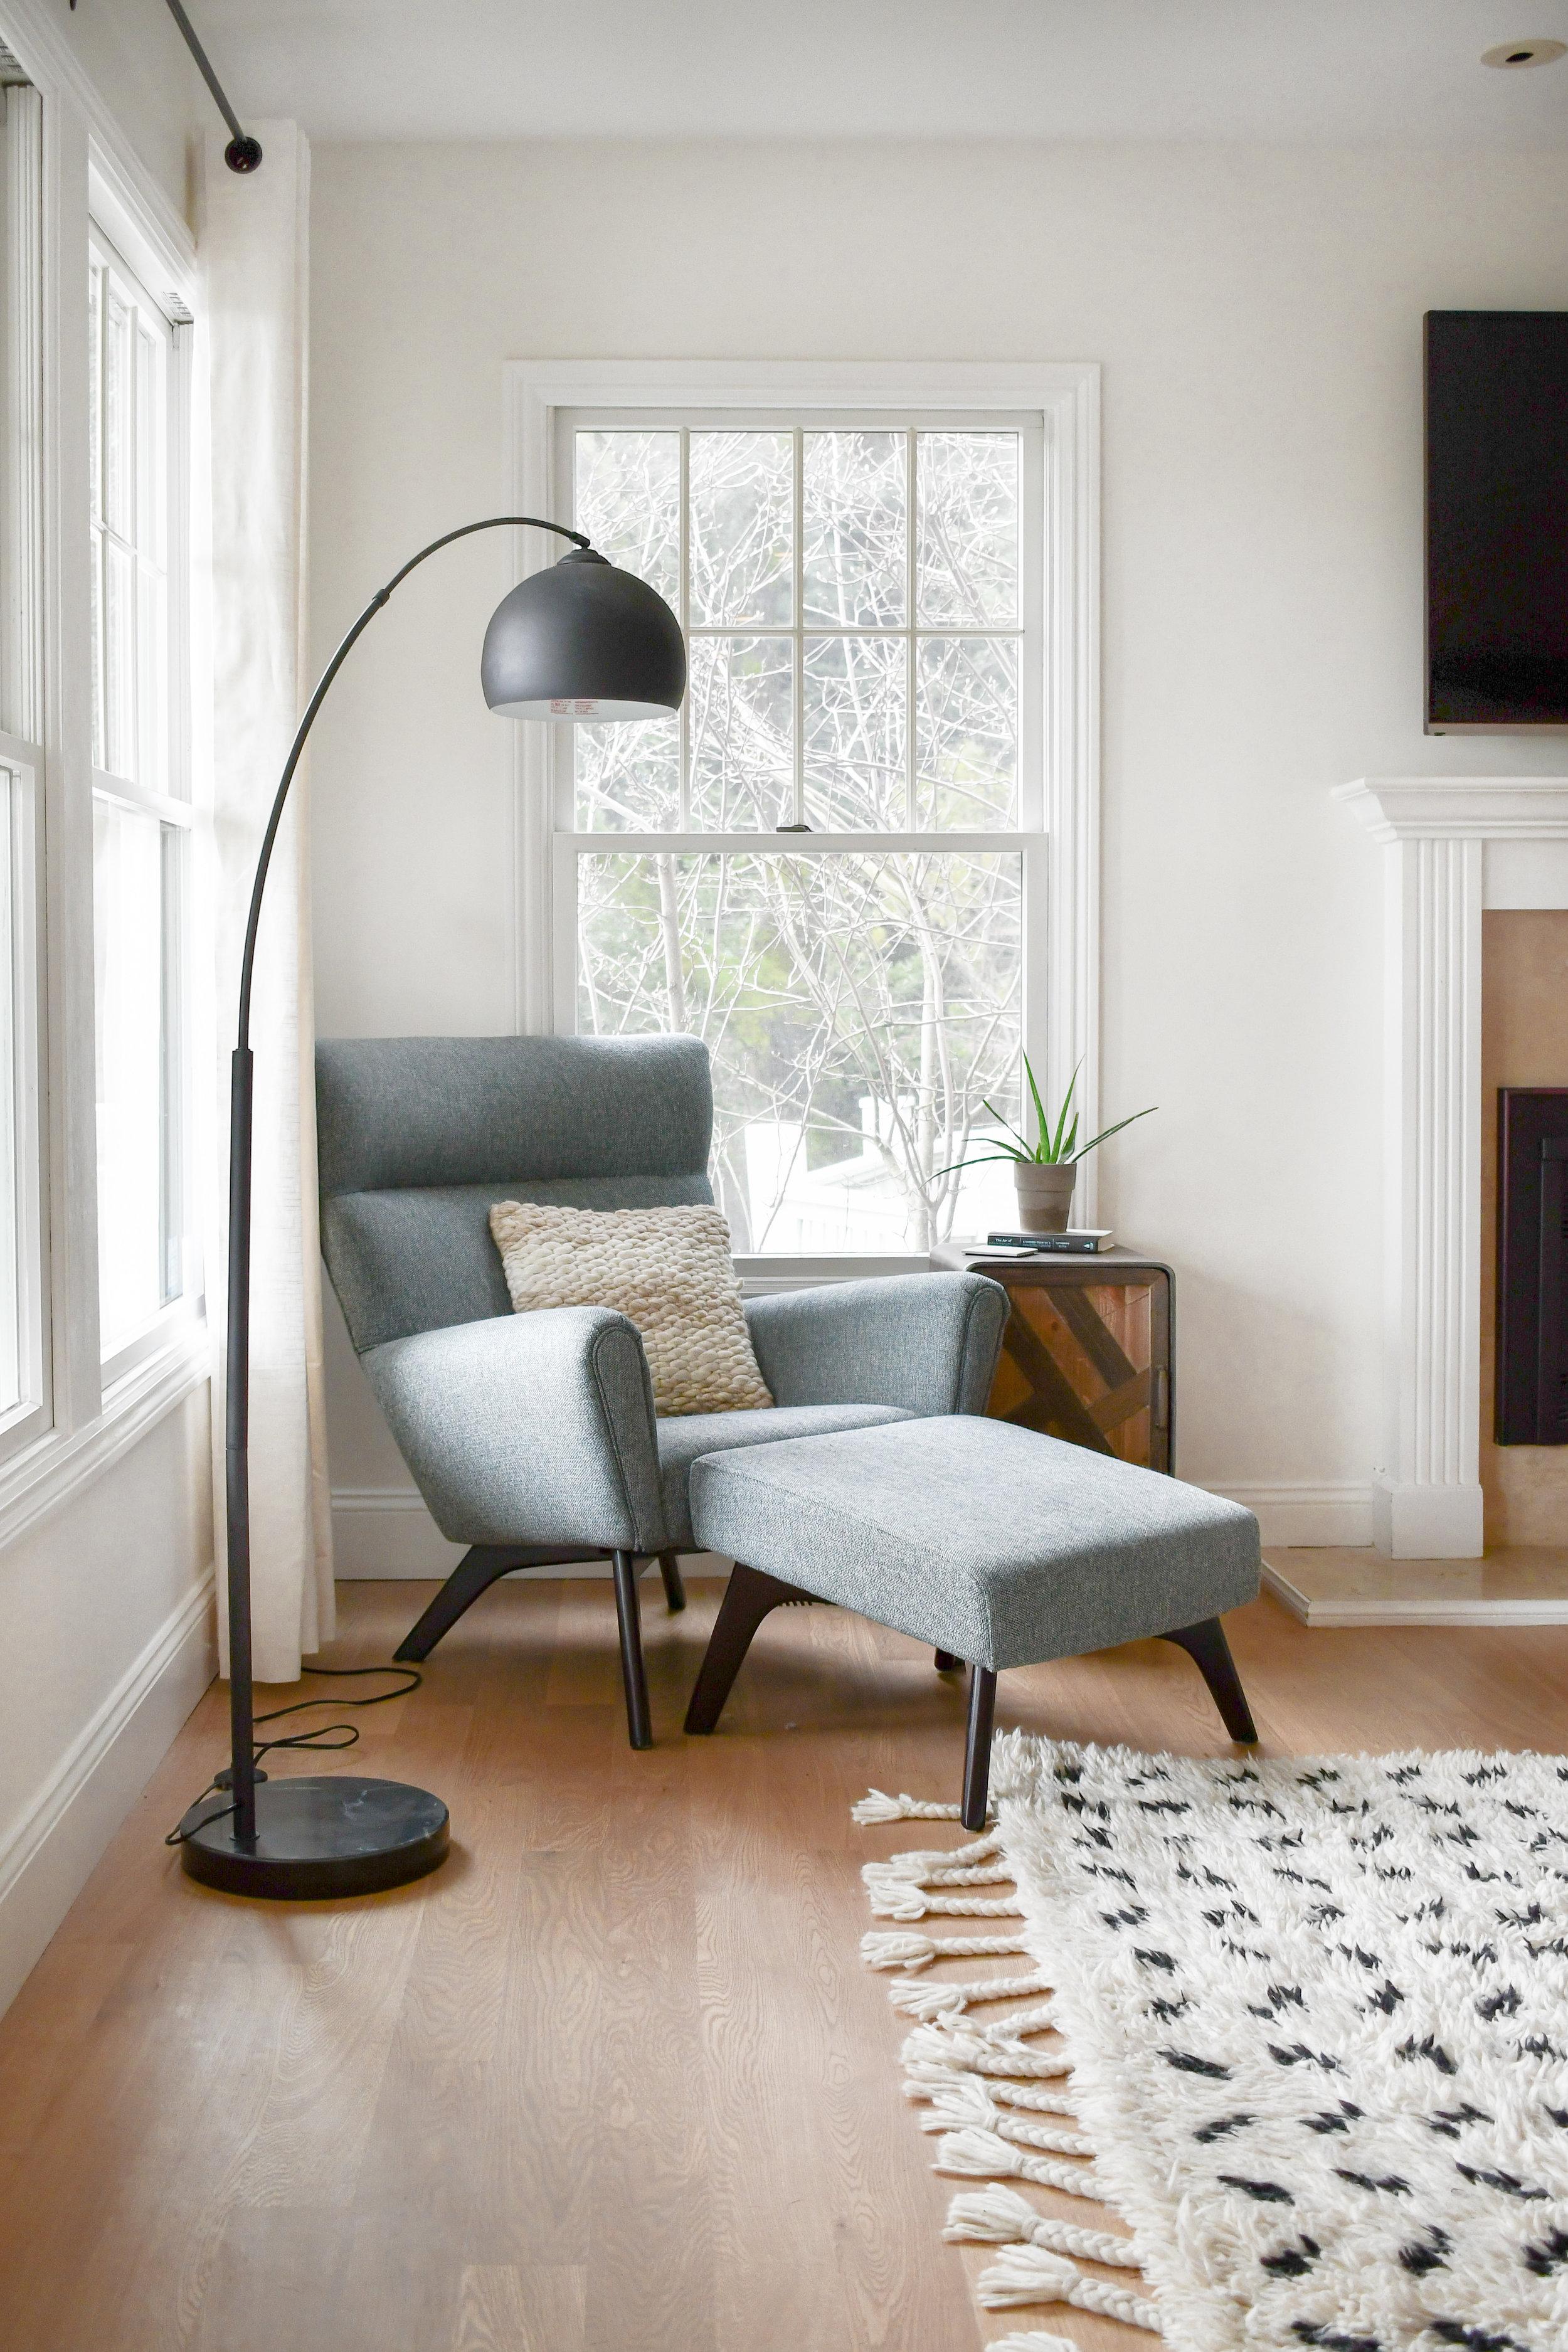 Angela Grace Design // Canyon Living Room // San Francisco and SF Bay Area Interior Designer, Decorator